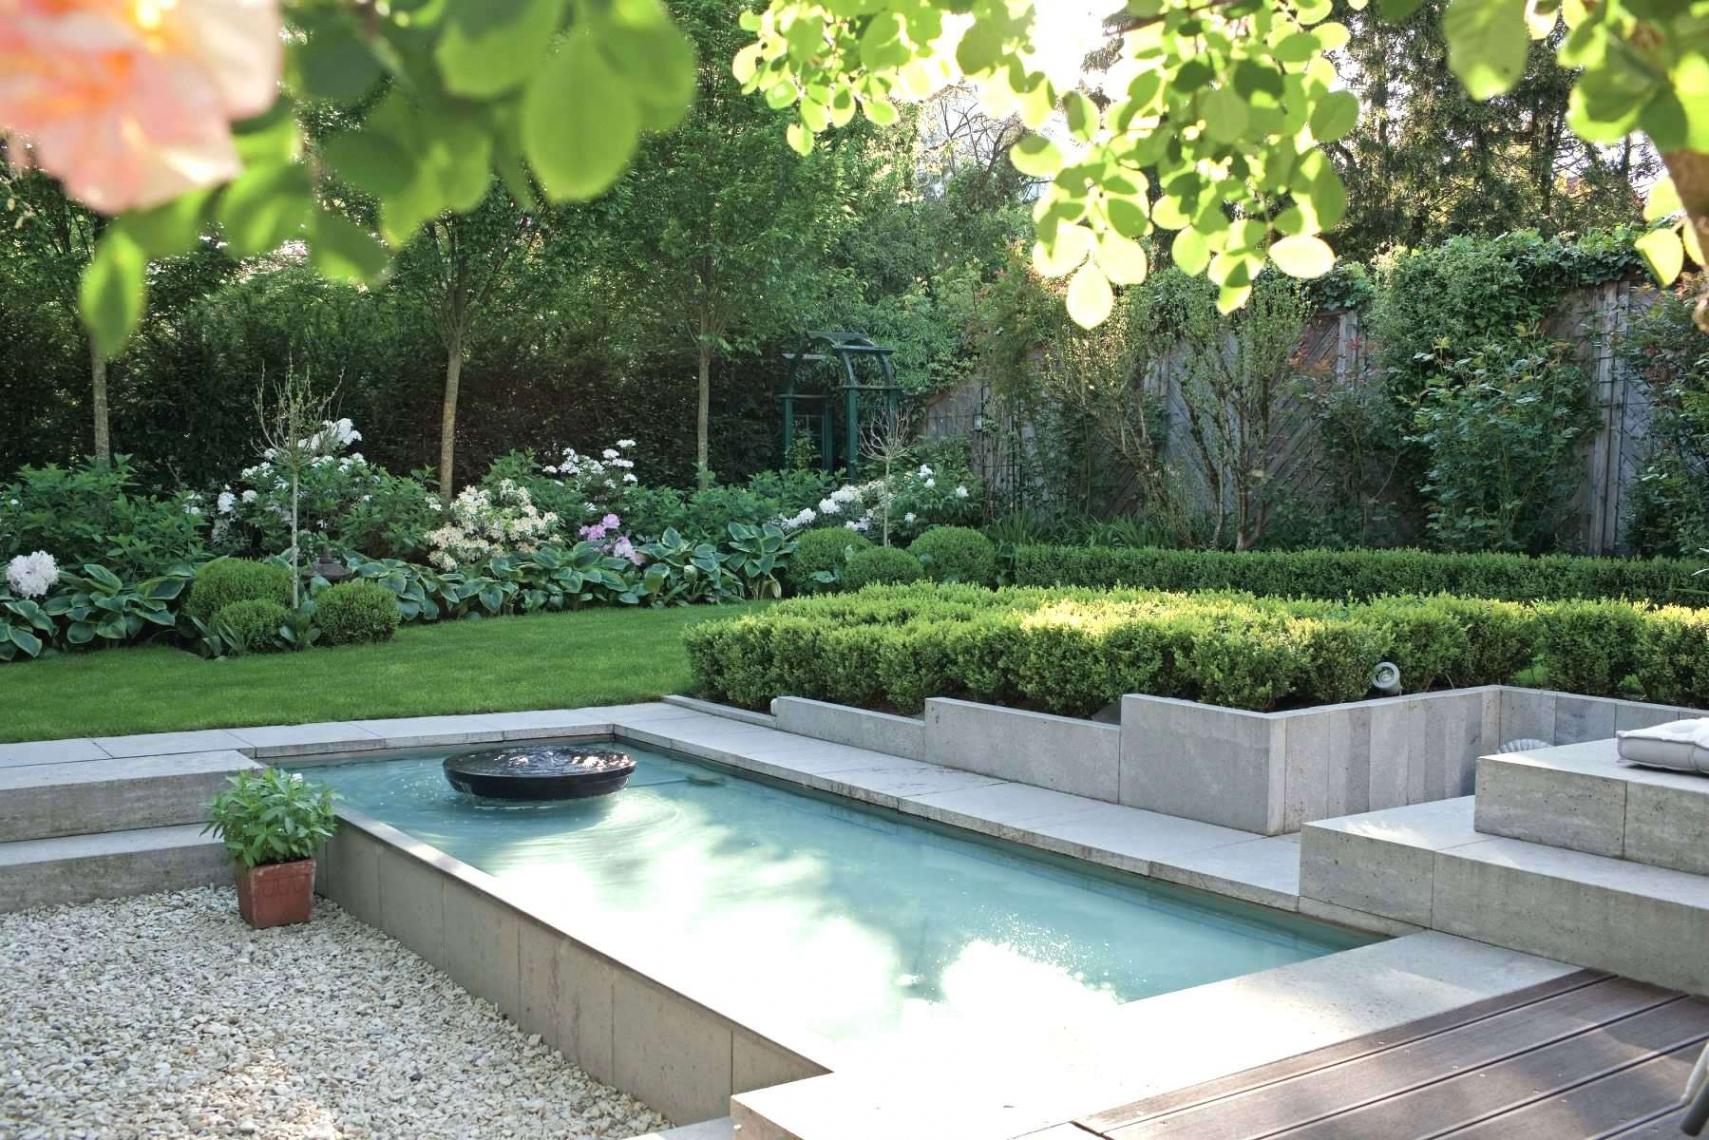 Garten Ideen Neu Grill Im Garten Gestalten — Temobardz Home Blog